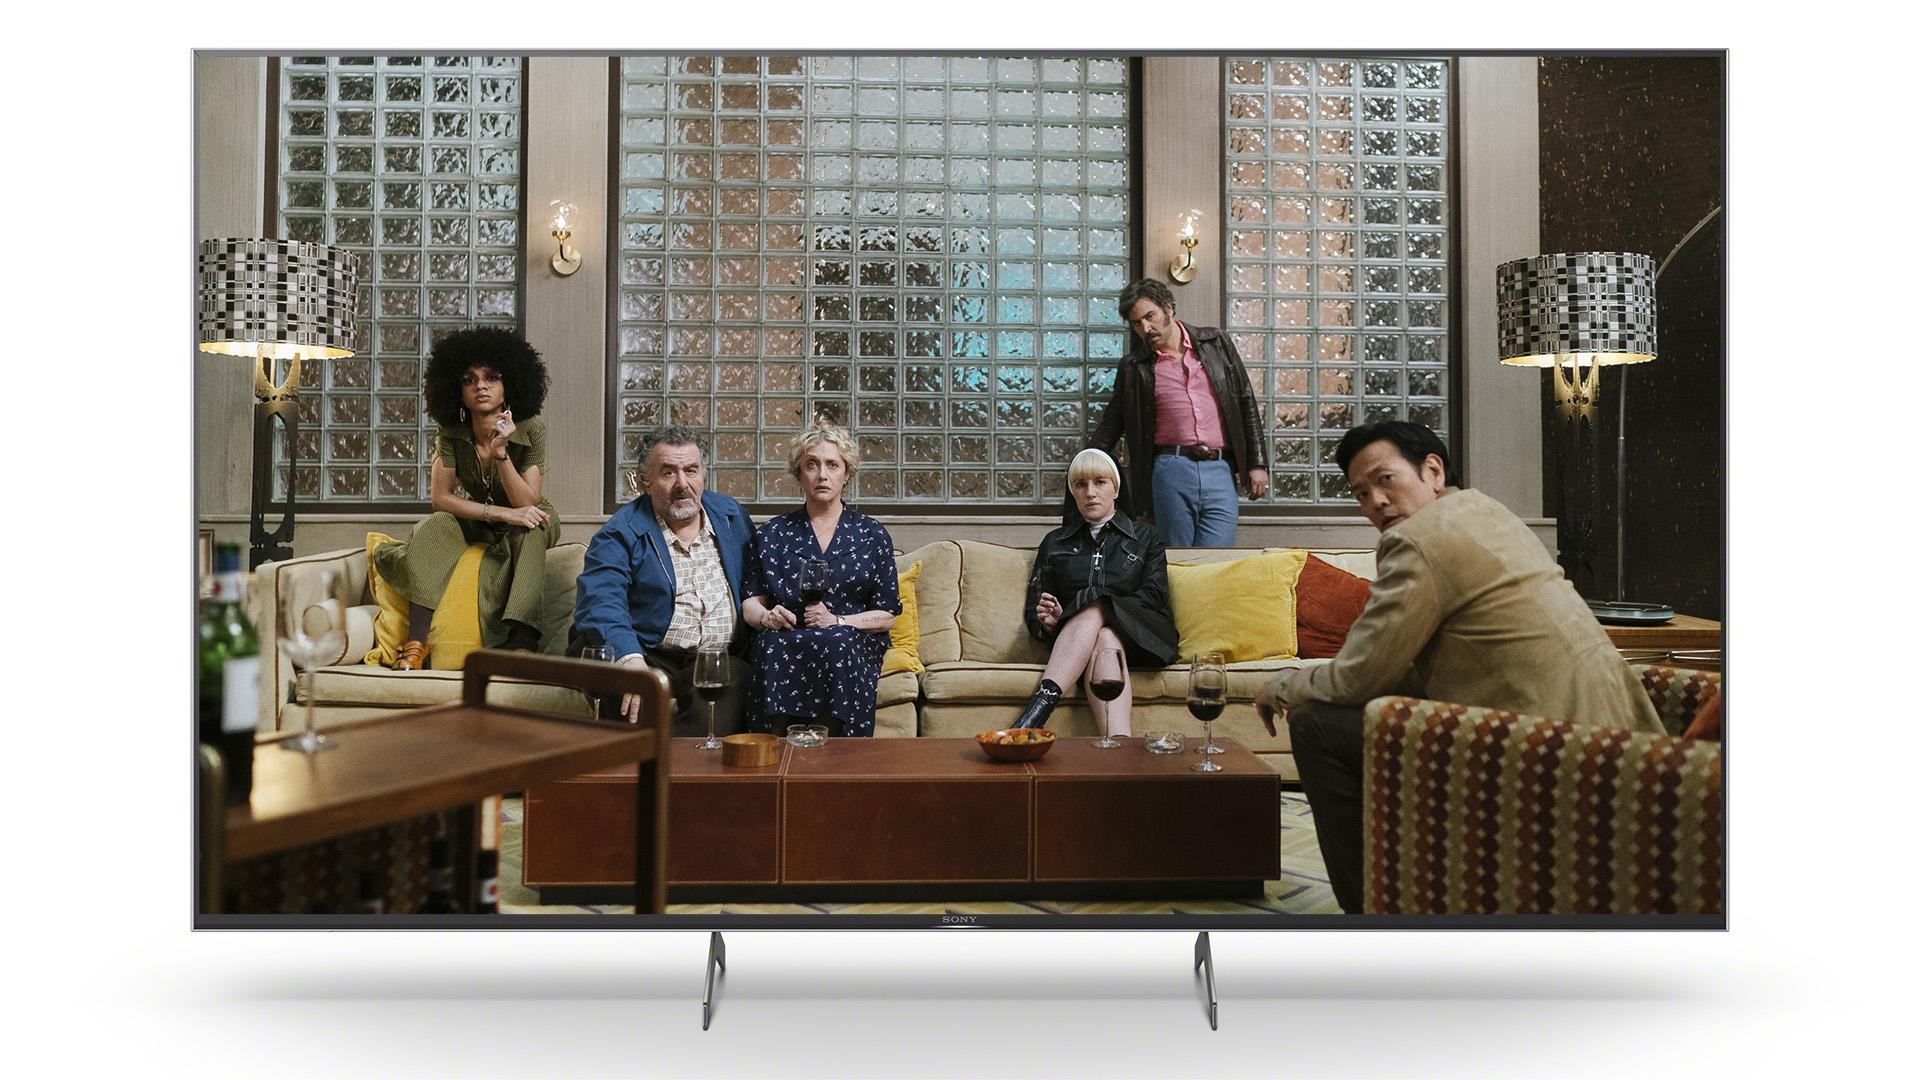 Best Sony TVs 2021: budget, premium and smart